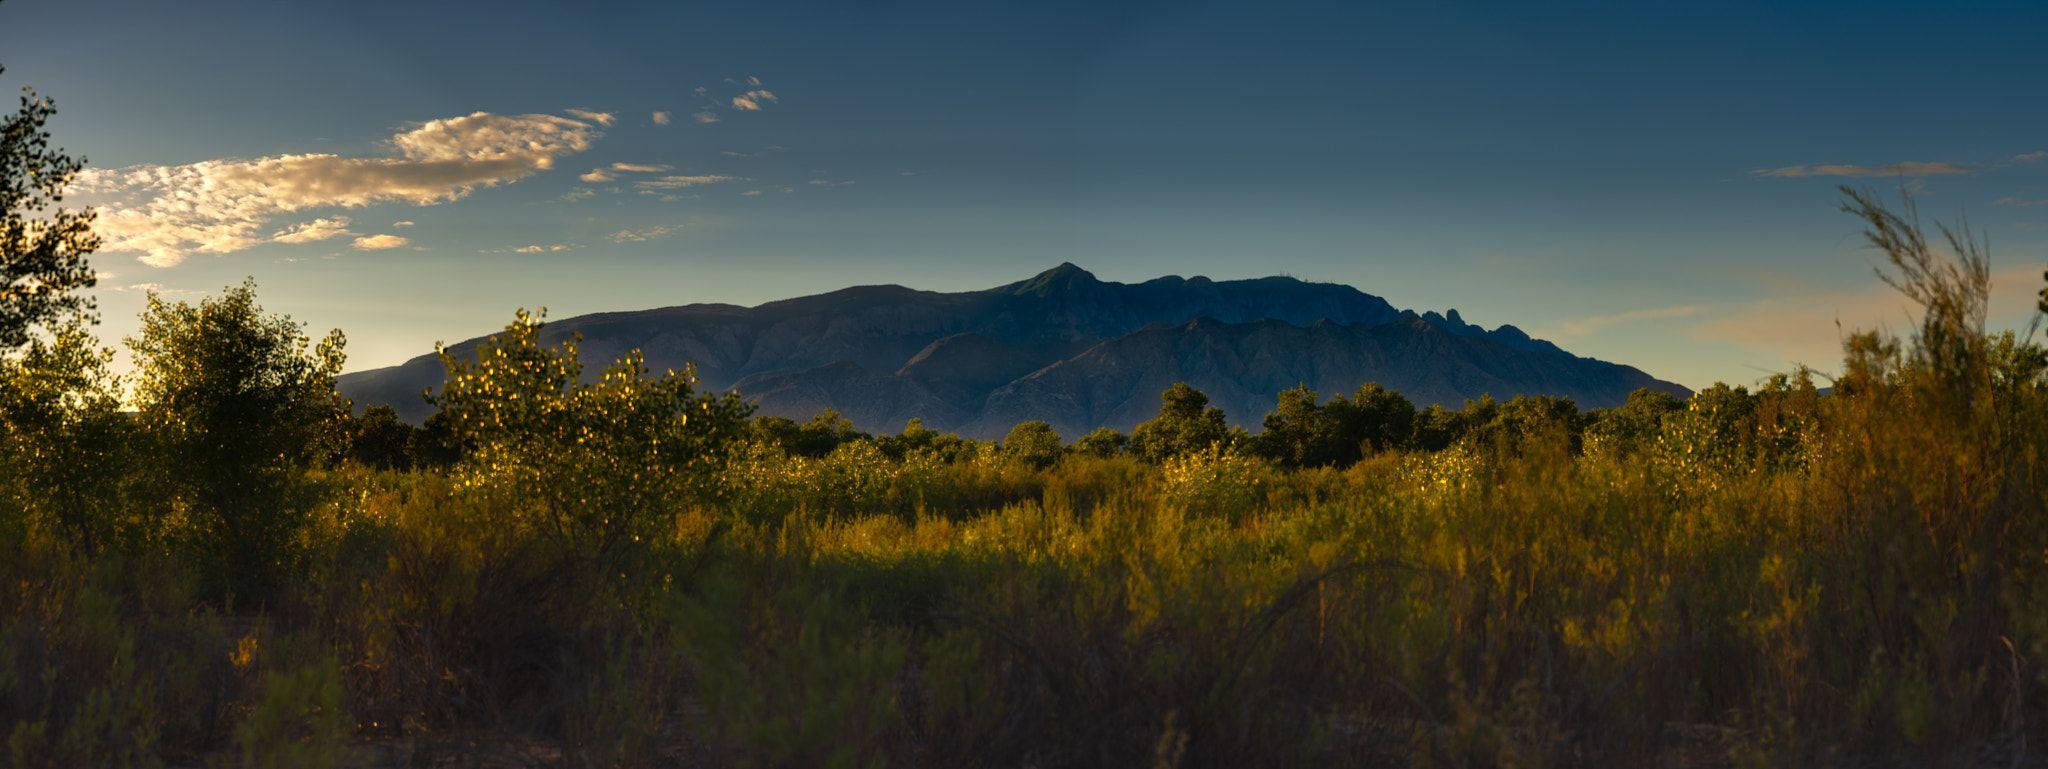 Best 56+ Sandia Mountains Wallpaper on HipWallpaper